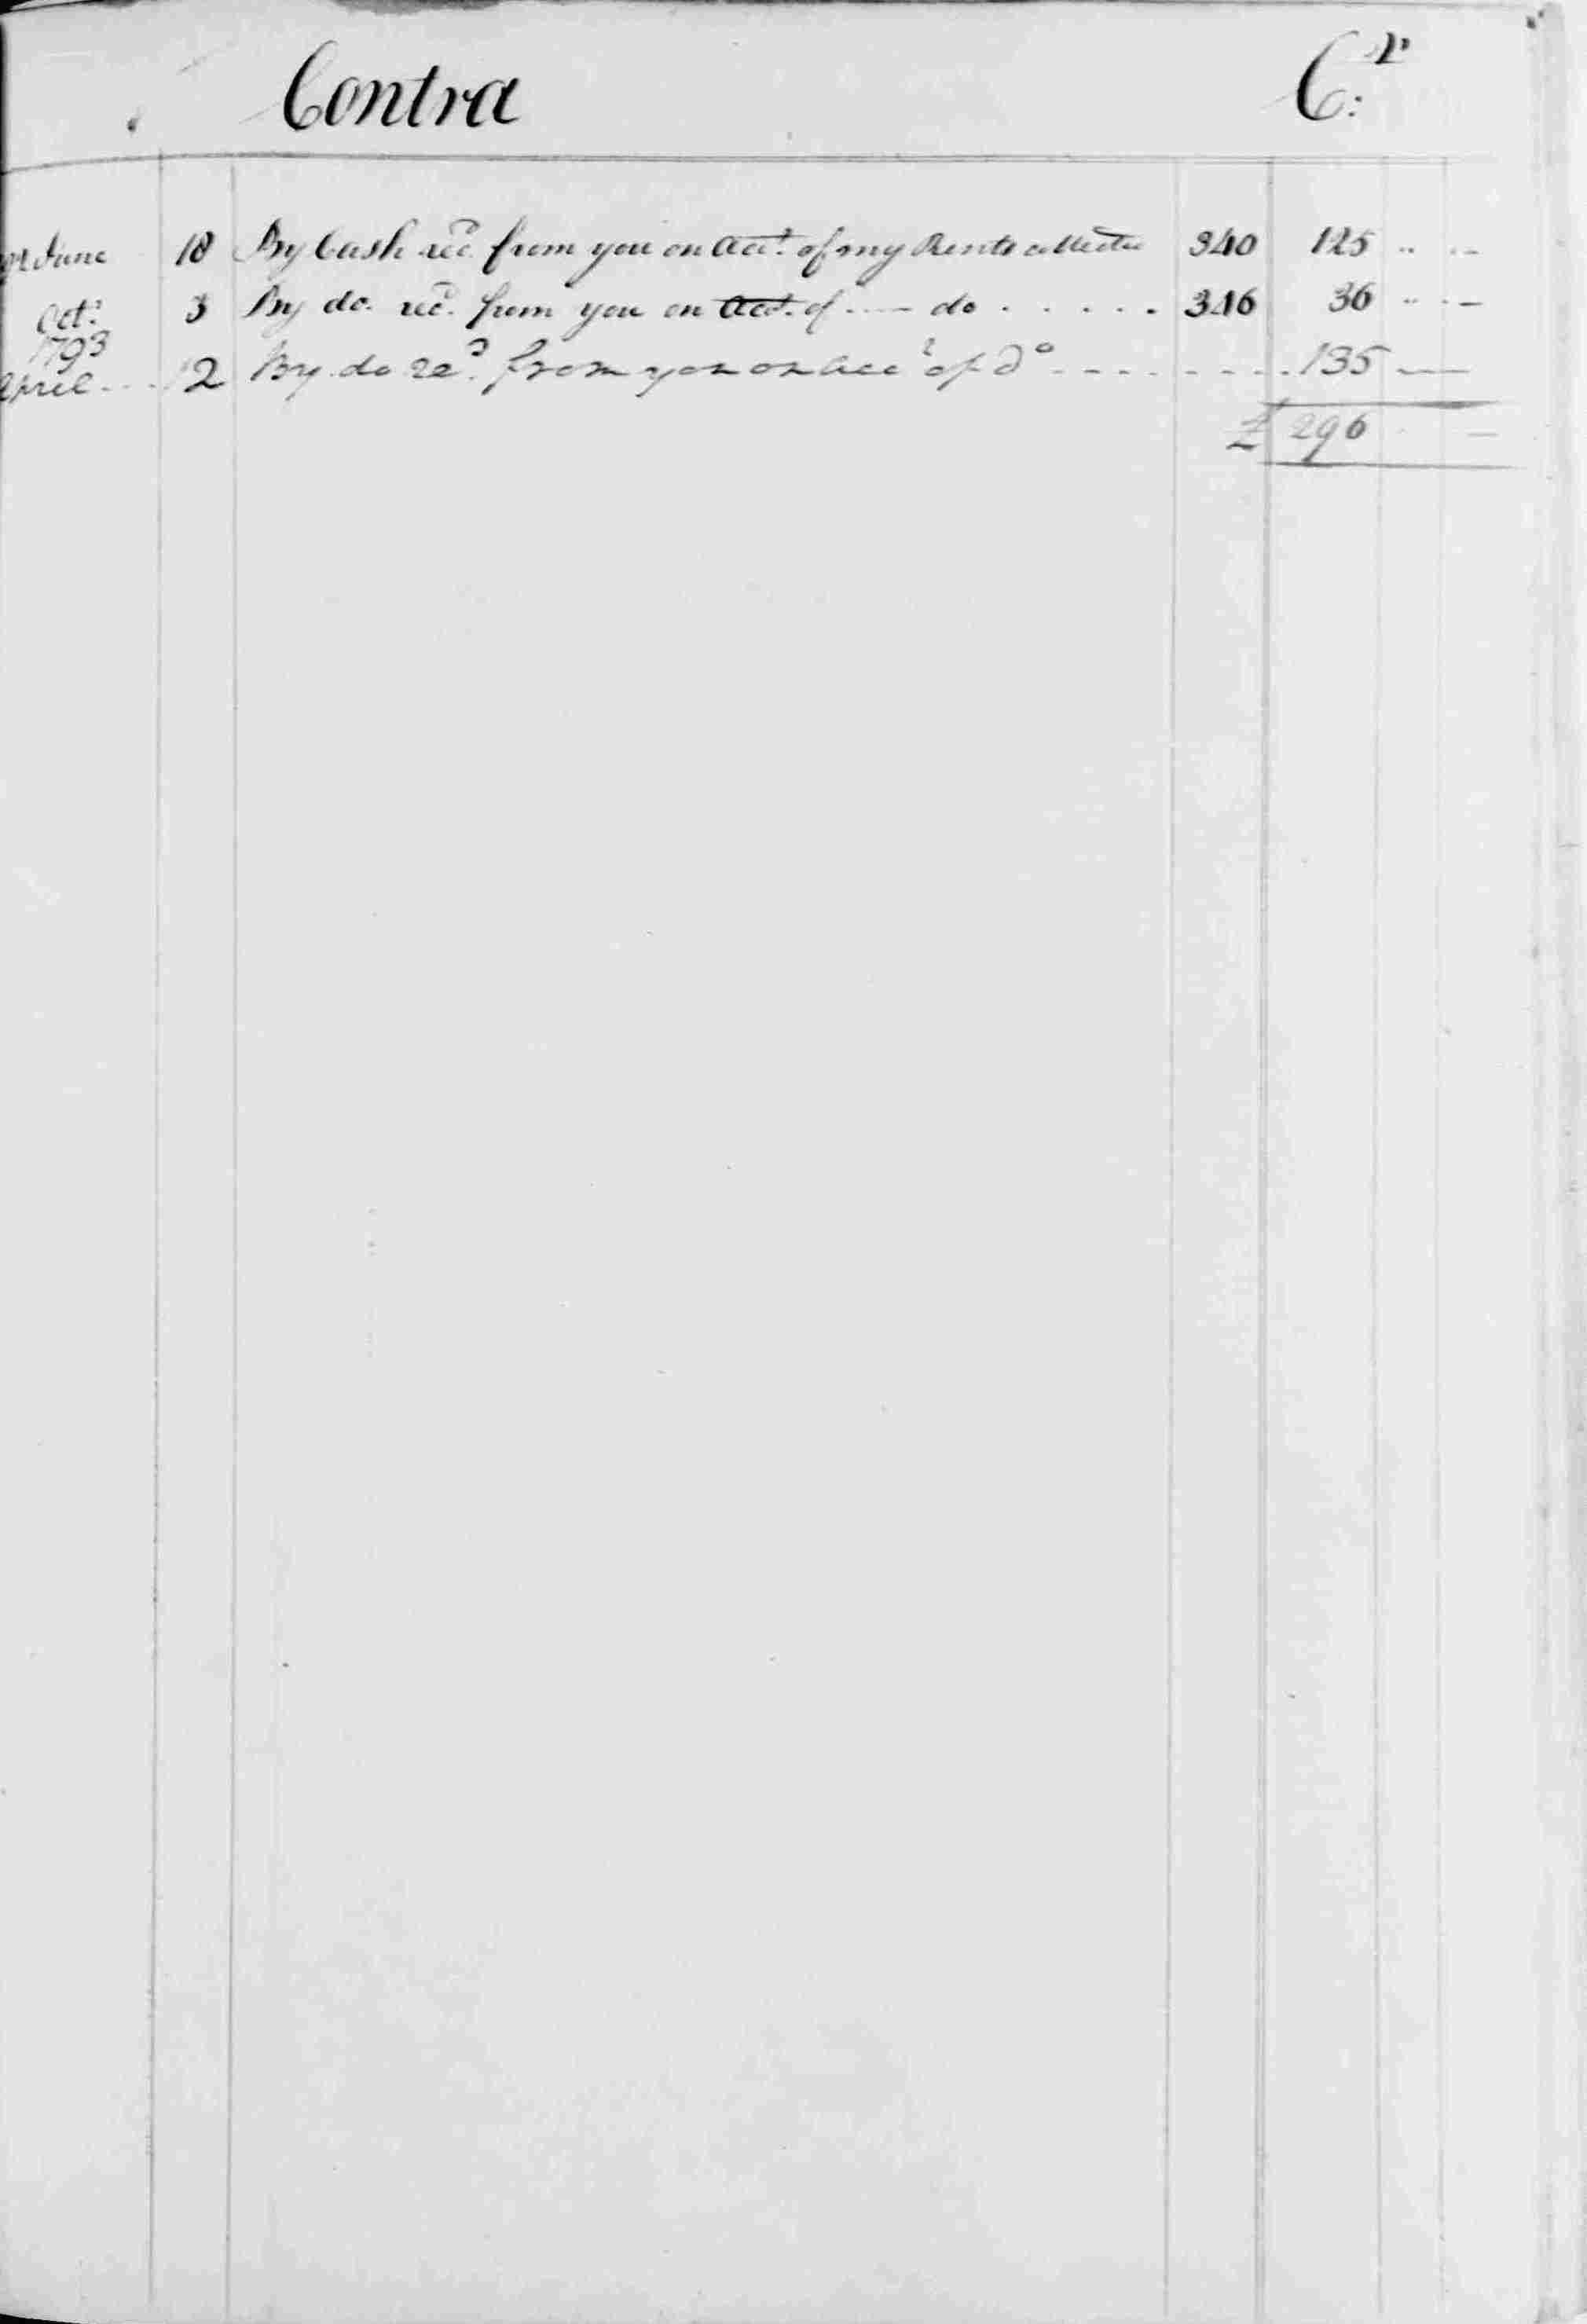 Ledger B, folio 360, right side